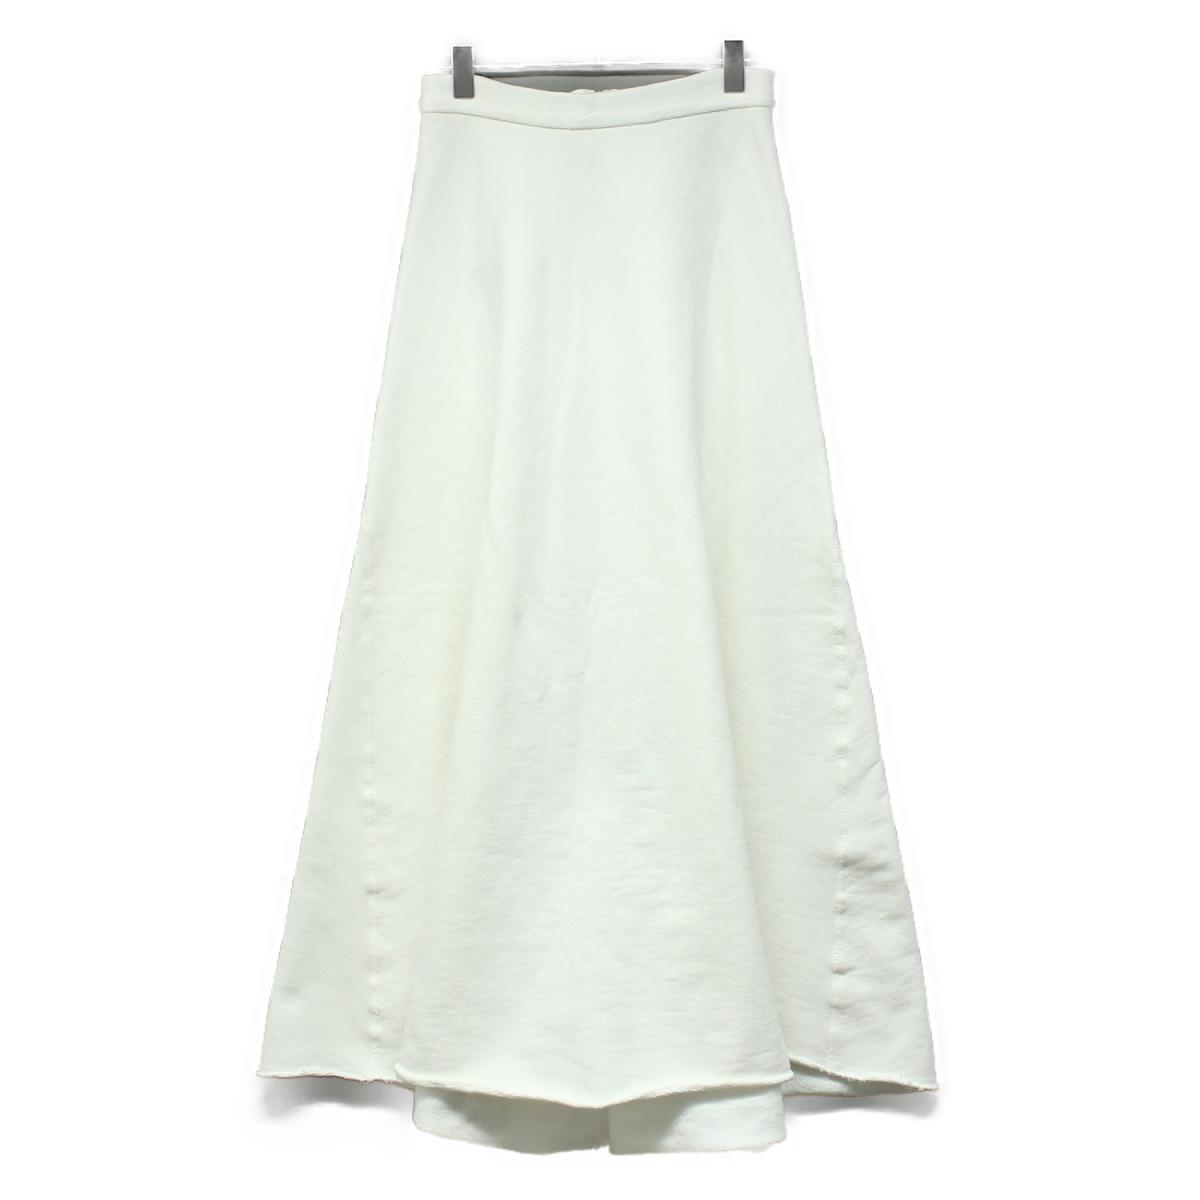 ATON エイトン スウェット フレア ロングスカート GAMENT DYE URAKE ホワイト 2 【レディース】【K2624】